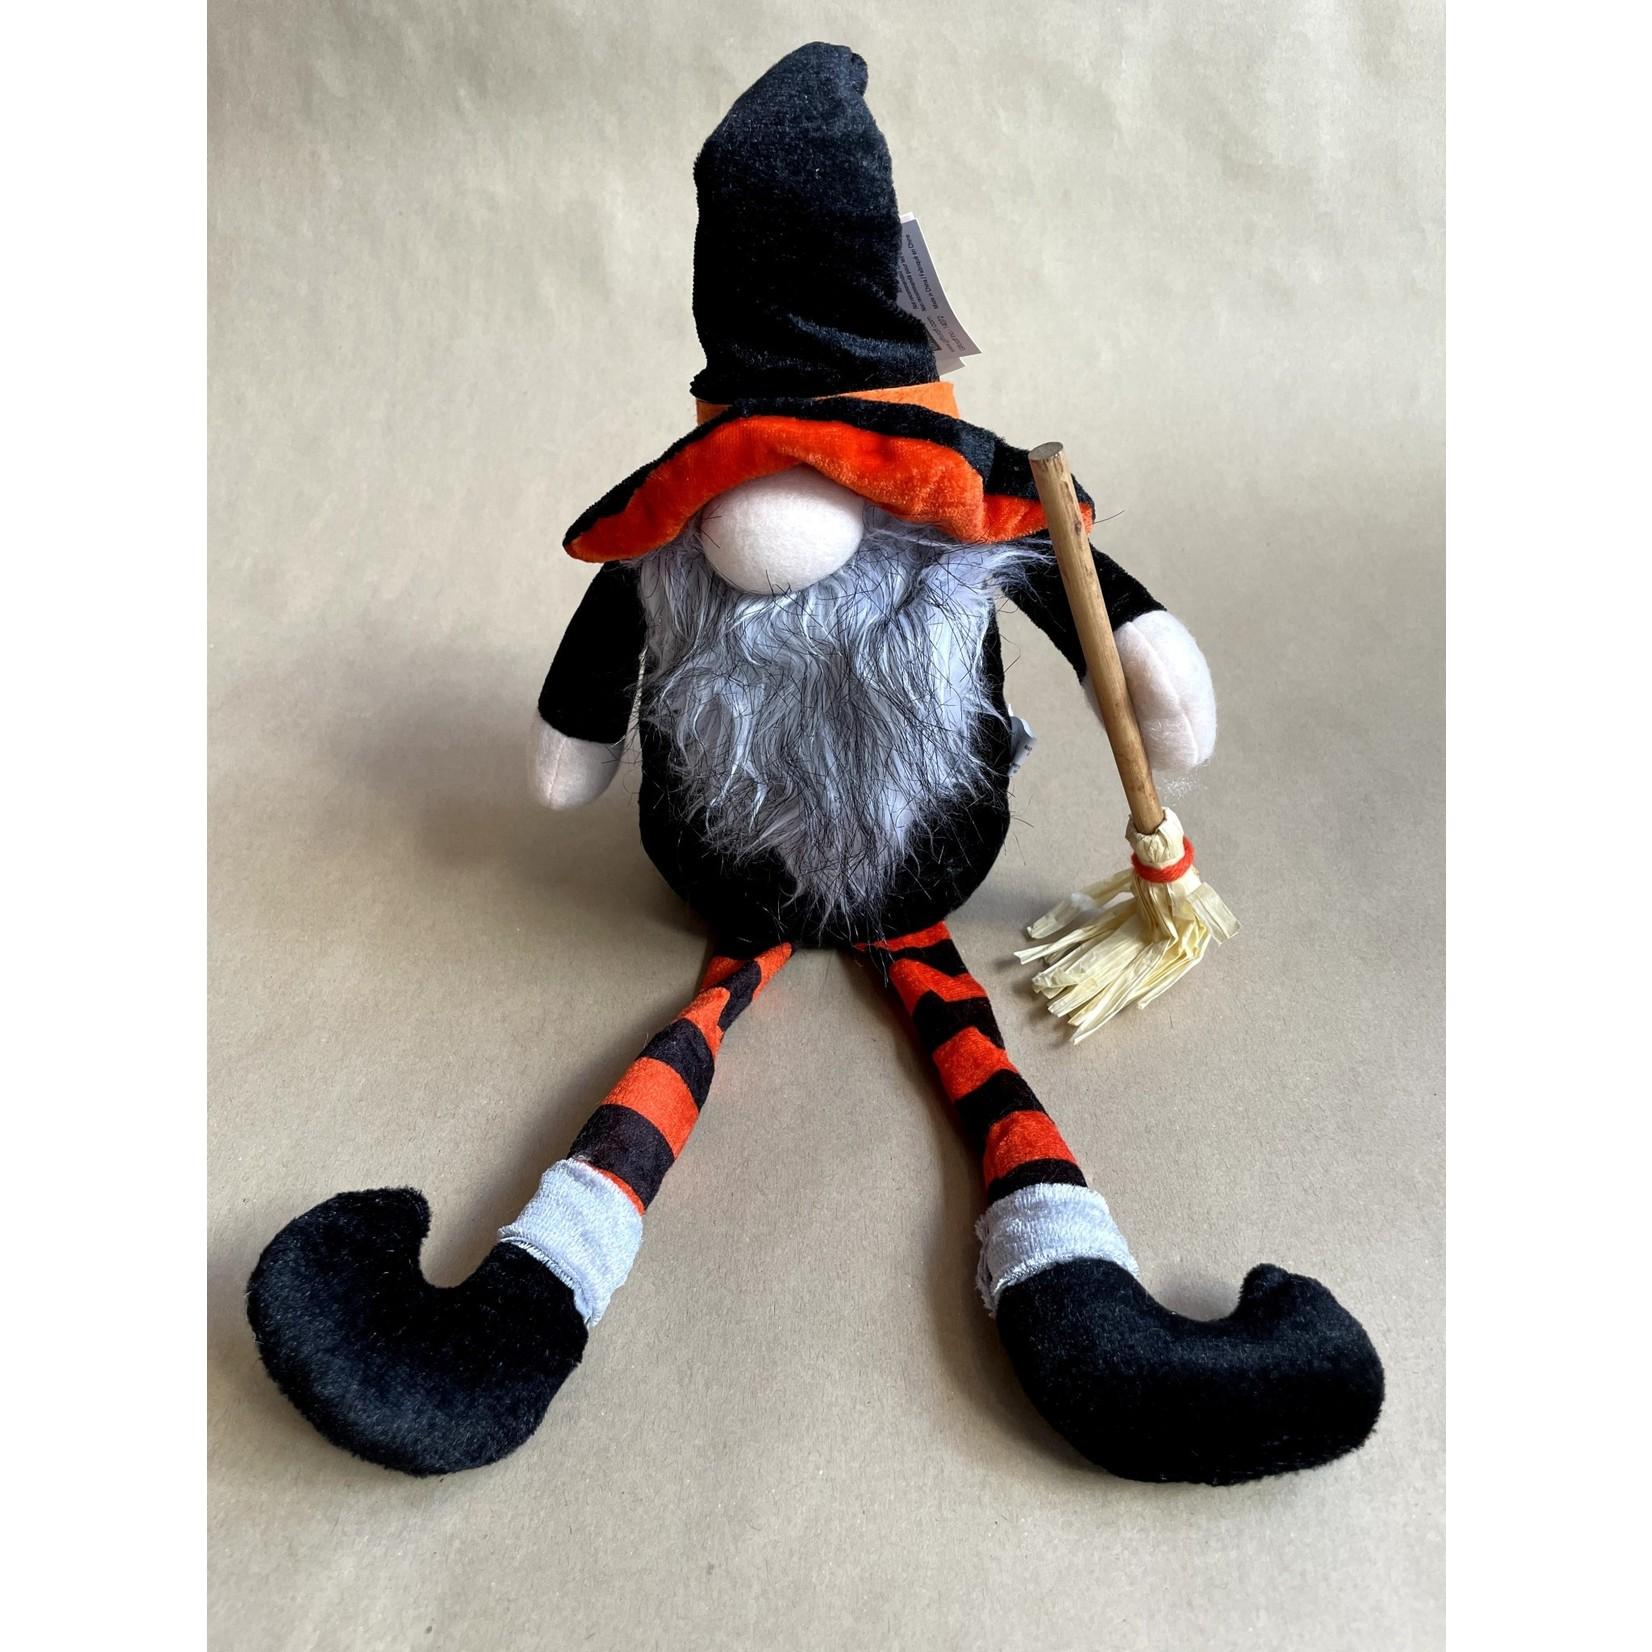 favourite things custom Halloween Edge Sitter Gnome